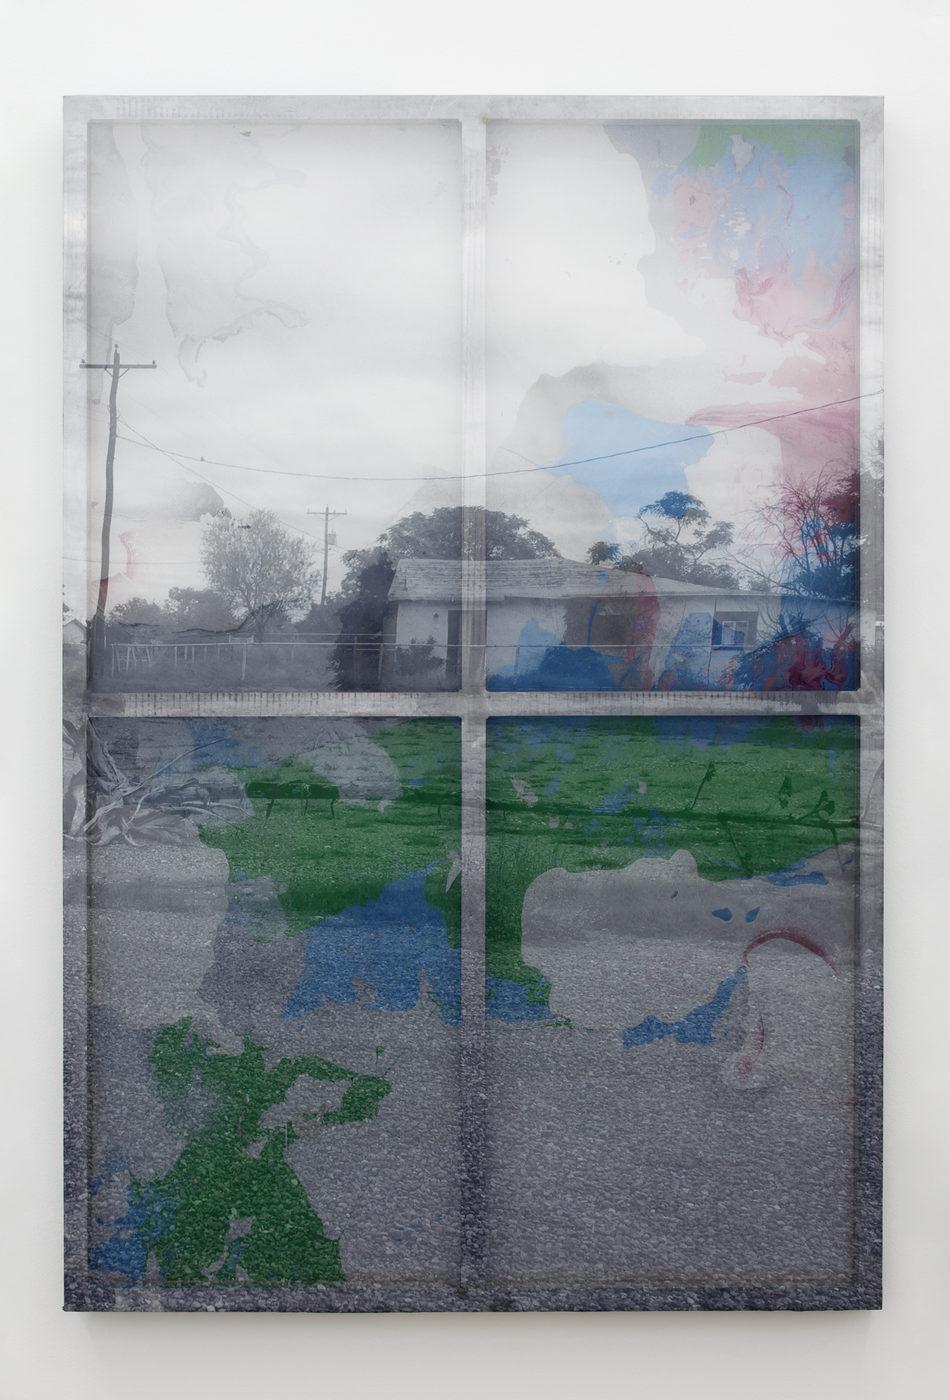 14a. Adrian Dan, Valentine, TX, 2016